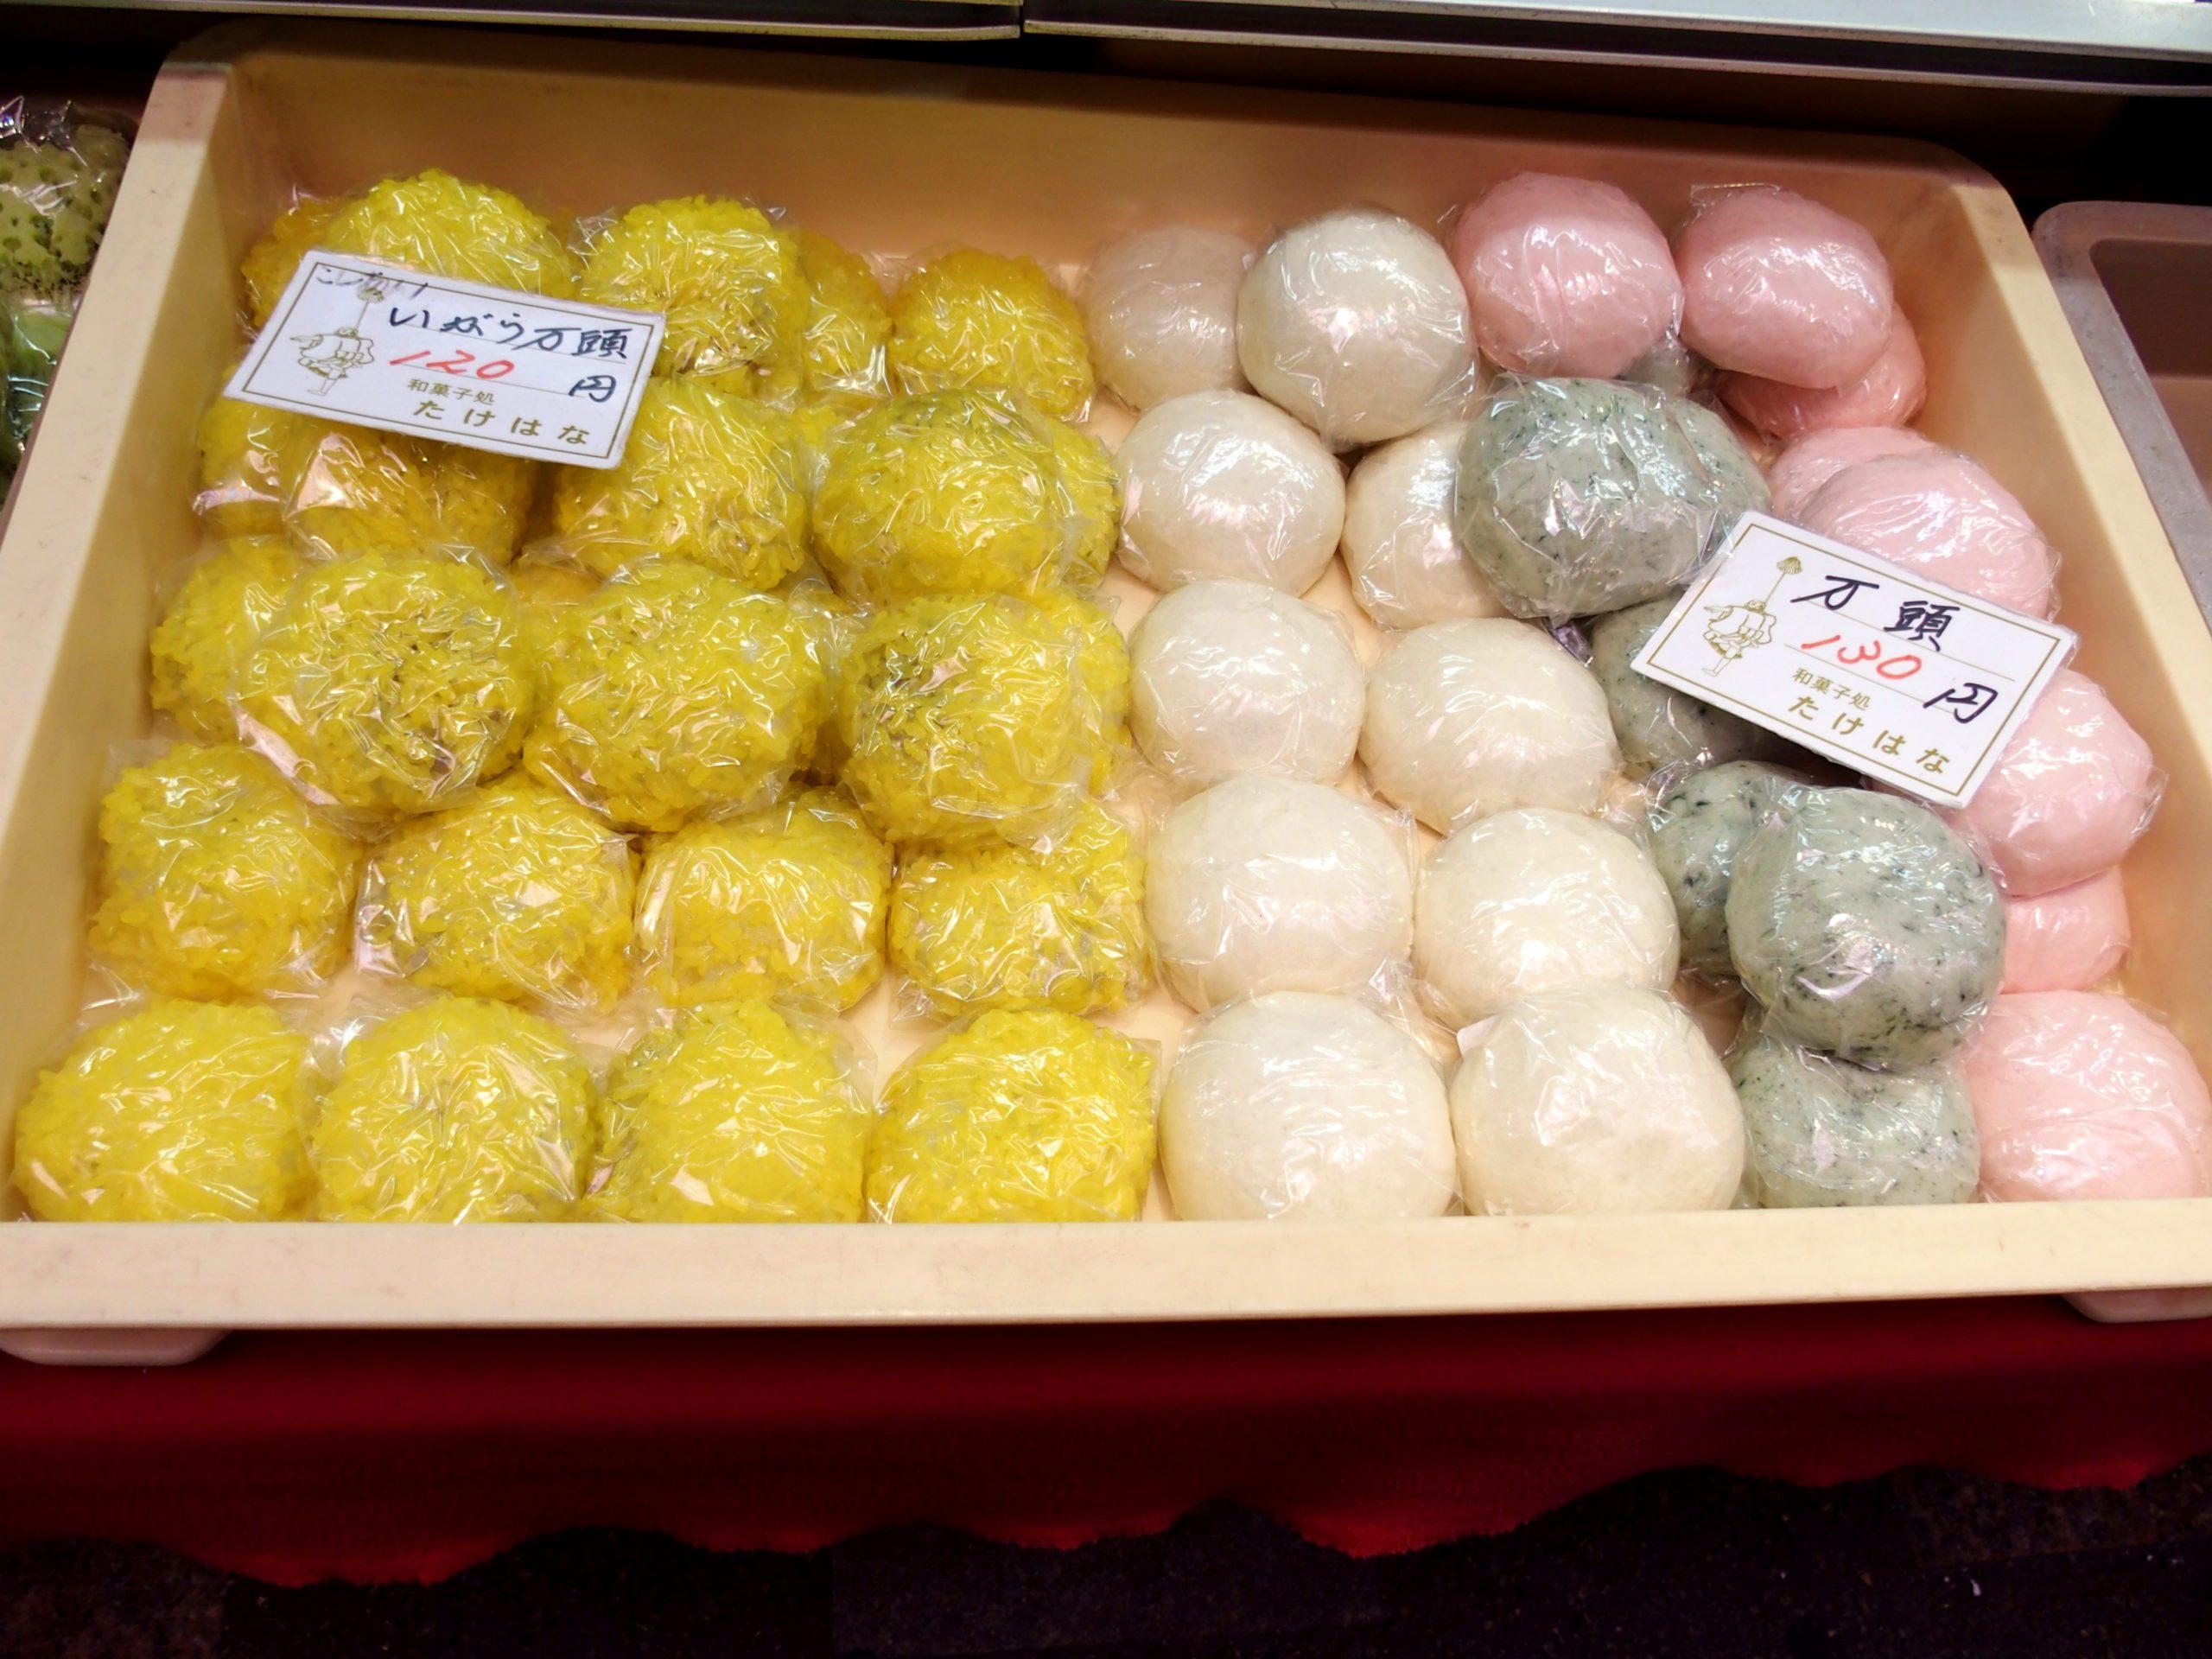 Manju (Japanese Steamed Cake) Omisho market Kanazawa Japan